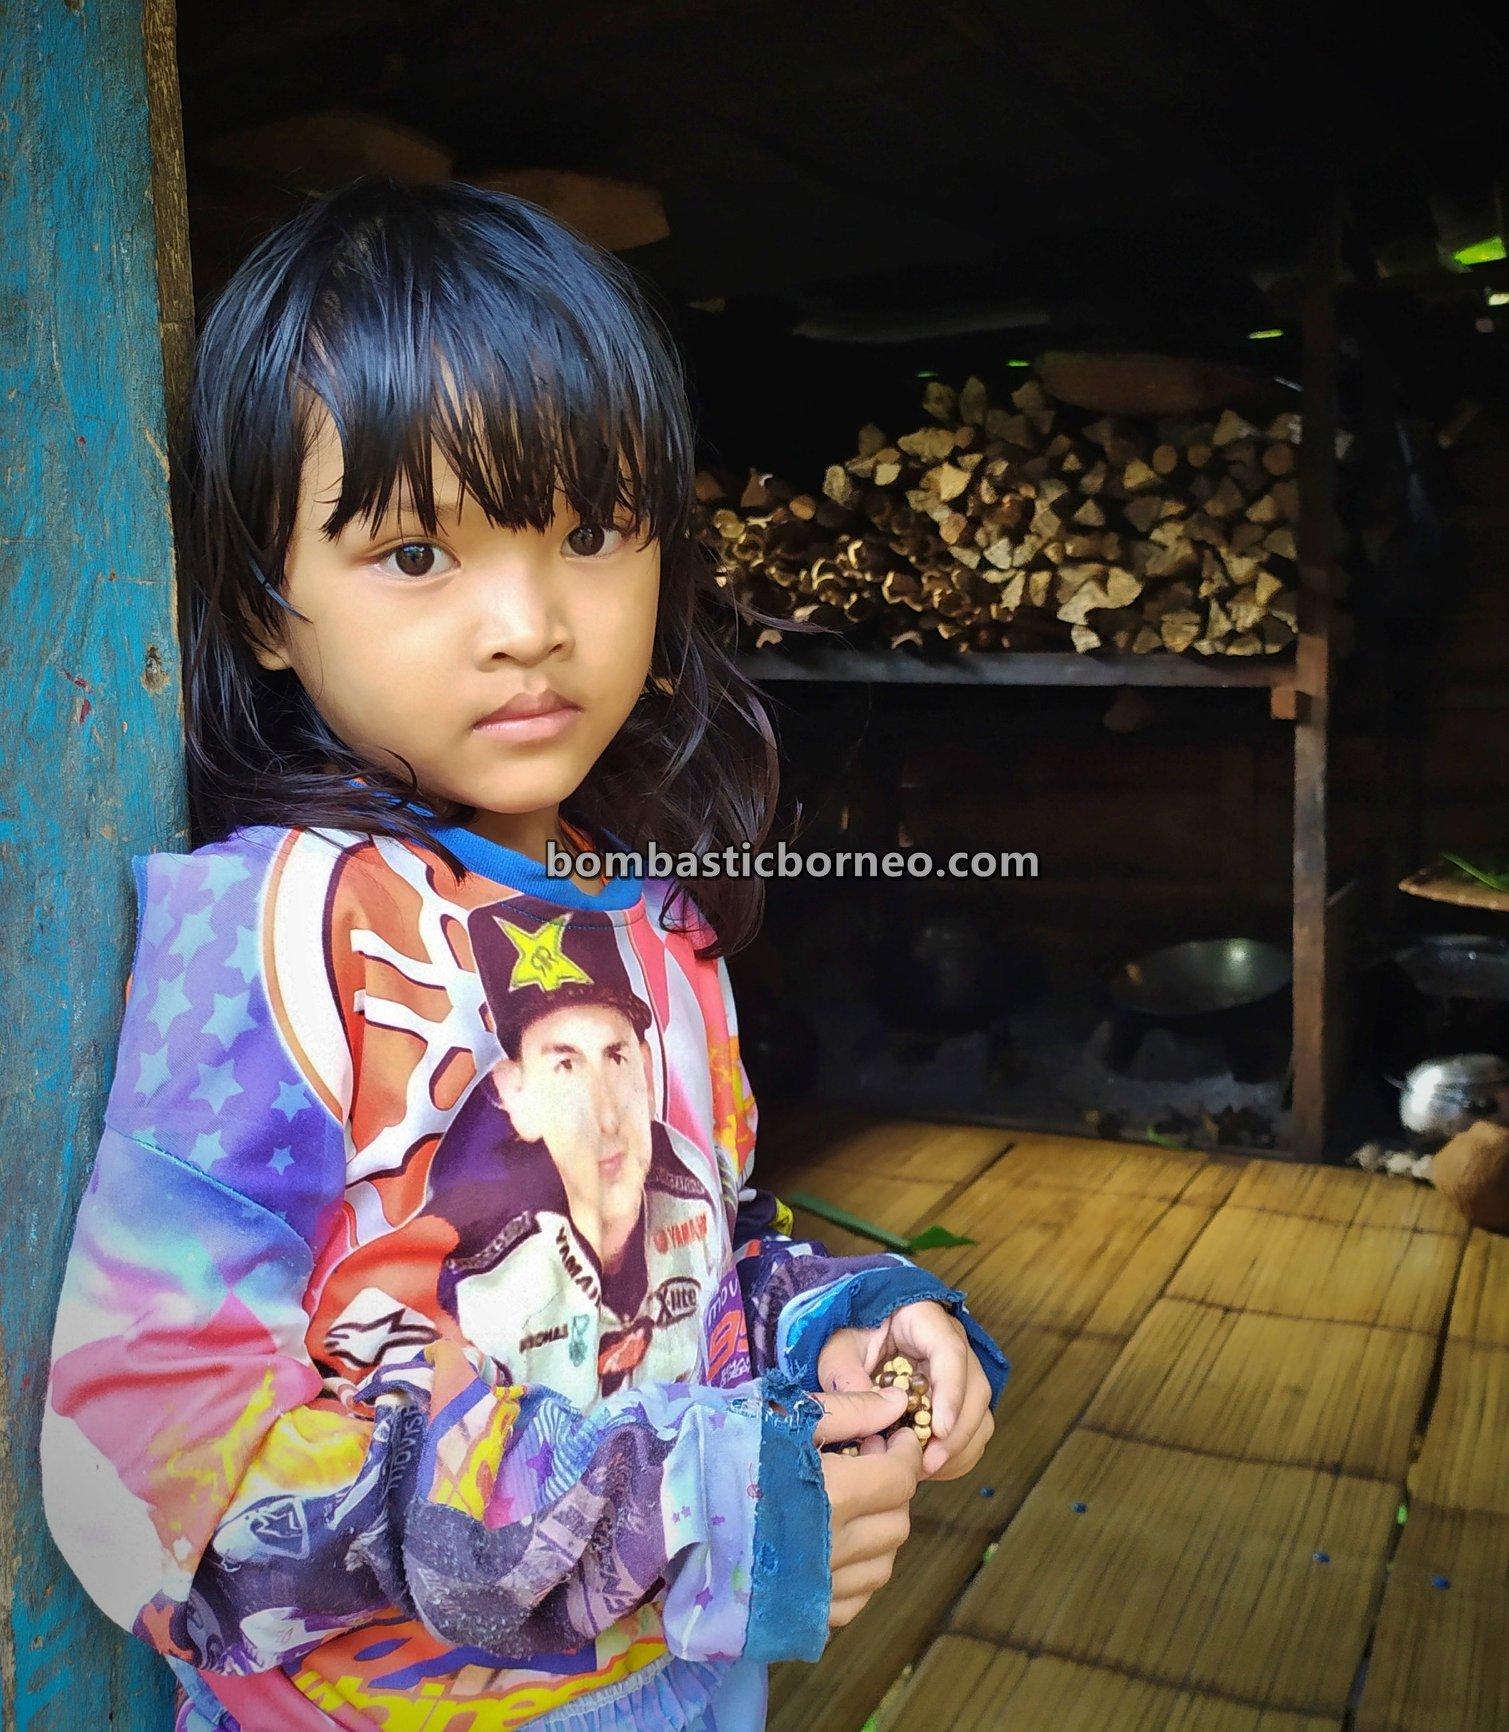 authentic, destination, Bengkayang, Indonesia, Ethnic, native, tribe, village, Tourism, tourist attraction, Travel guide, Trans Borneo, 婆罗洲达雅部落, 印尼西加里曼丹, 孟加映原住民